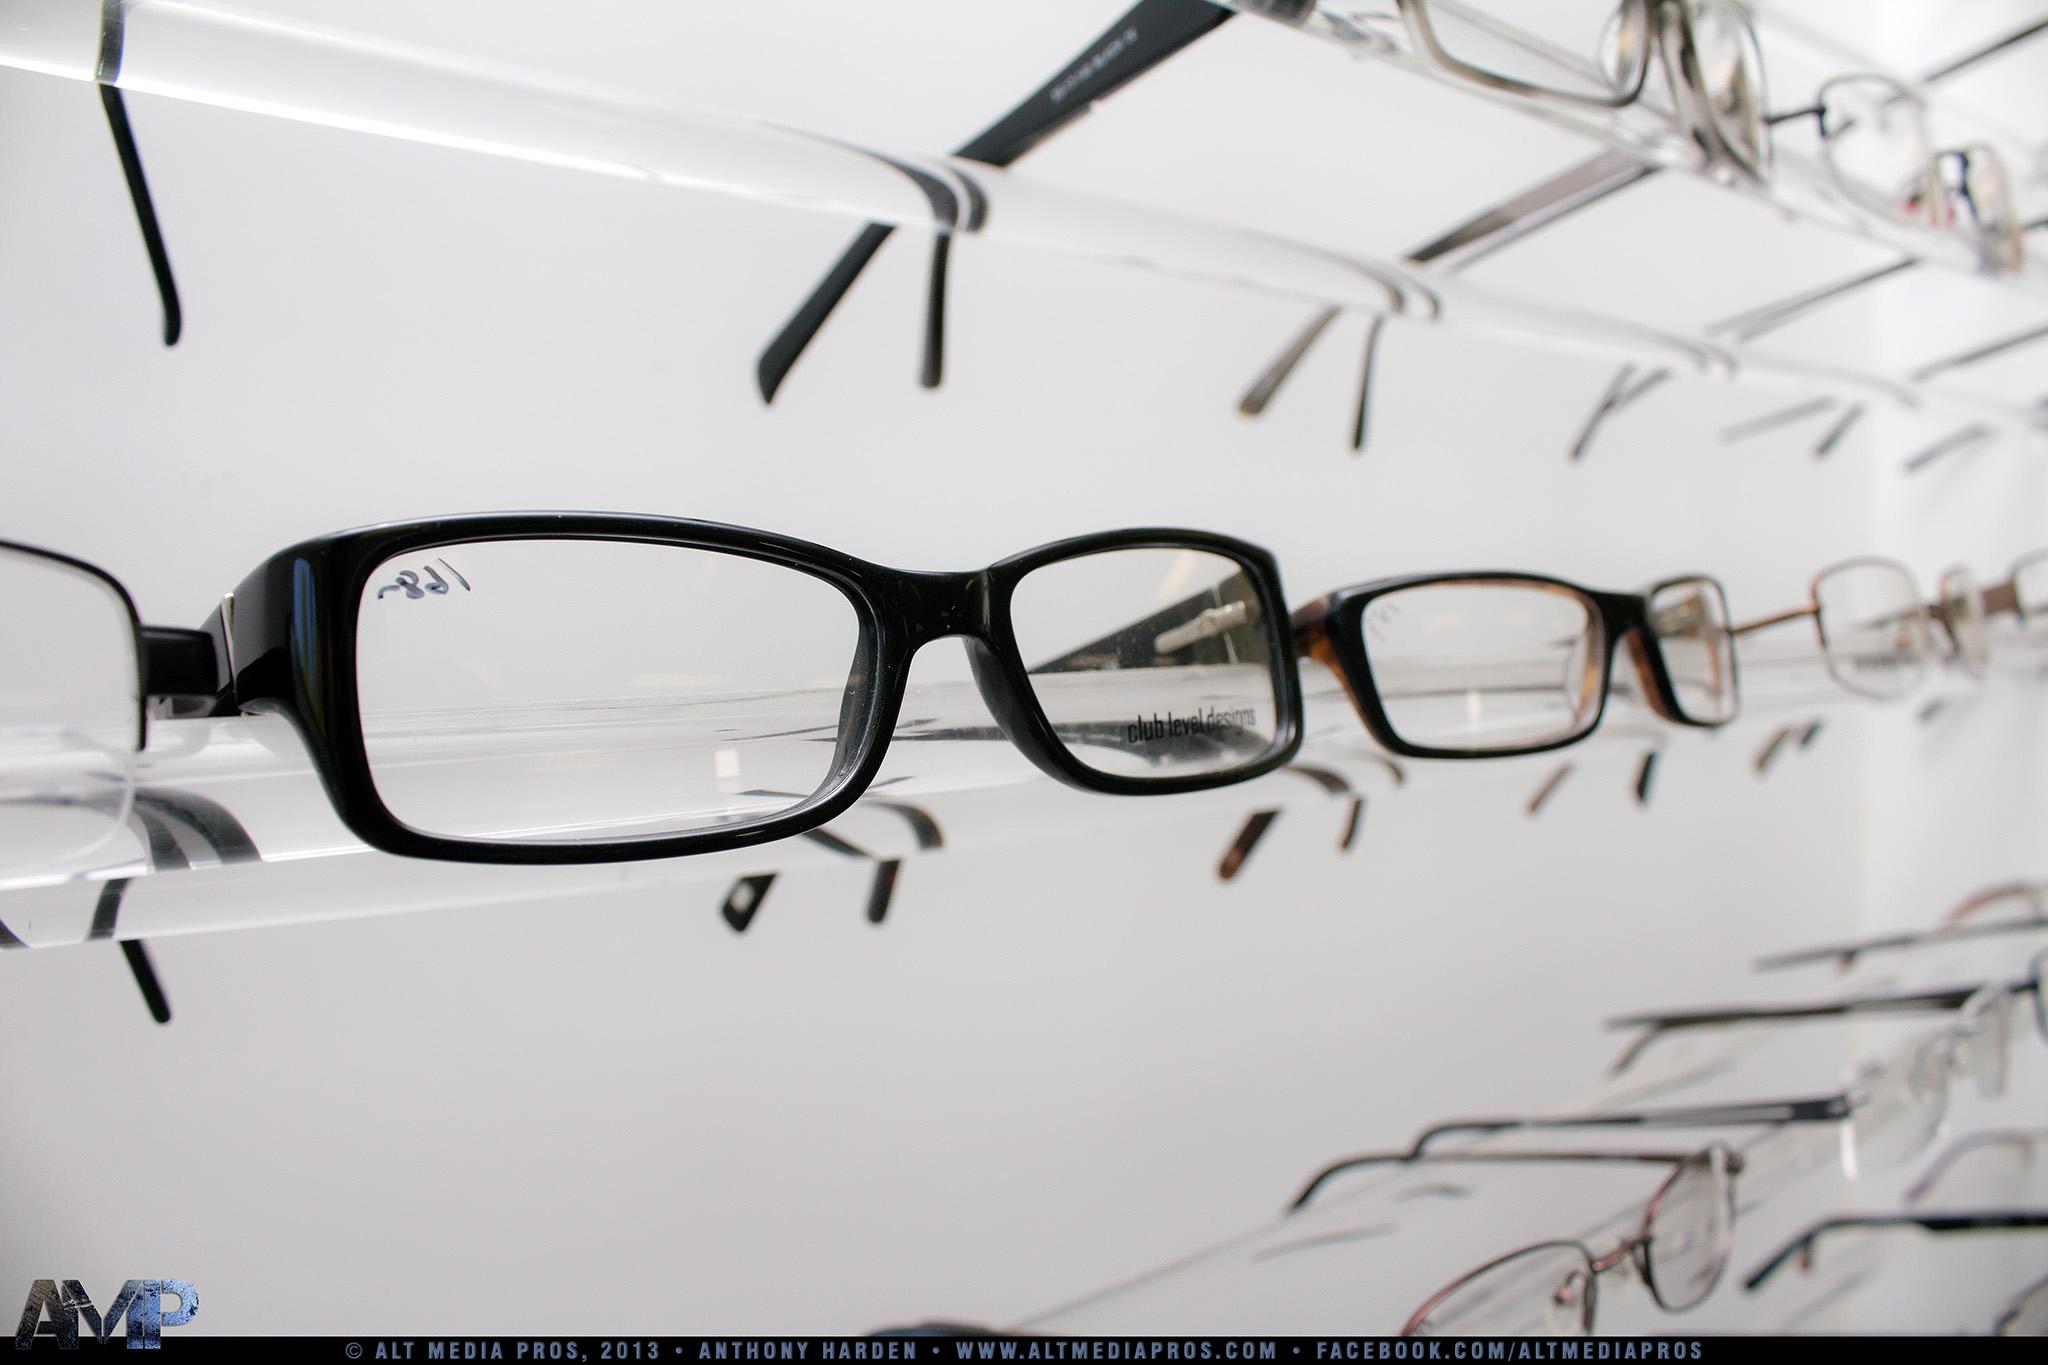 The Optical Shoppe_AMP_043013_013.jpg